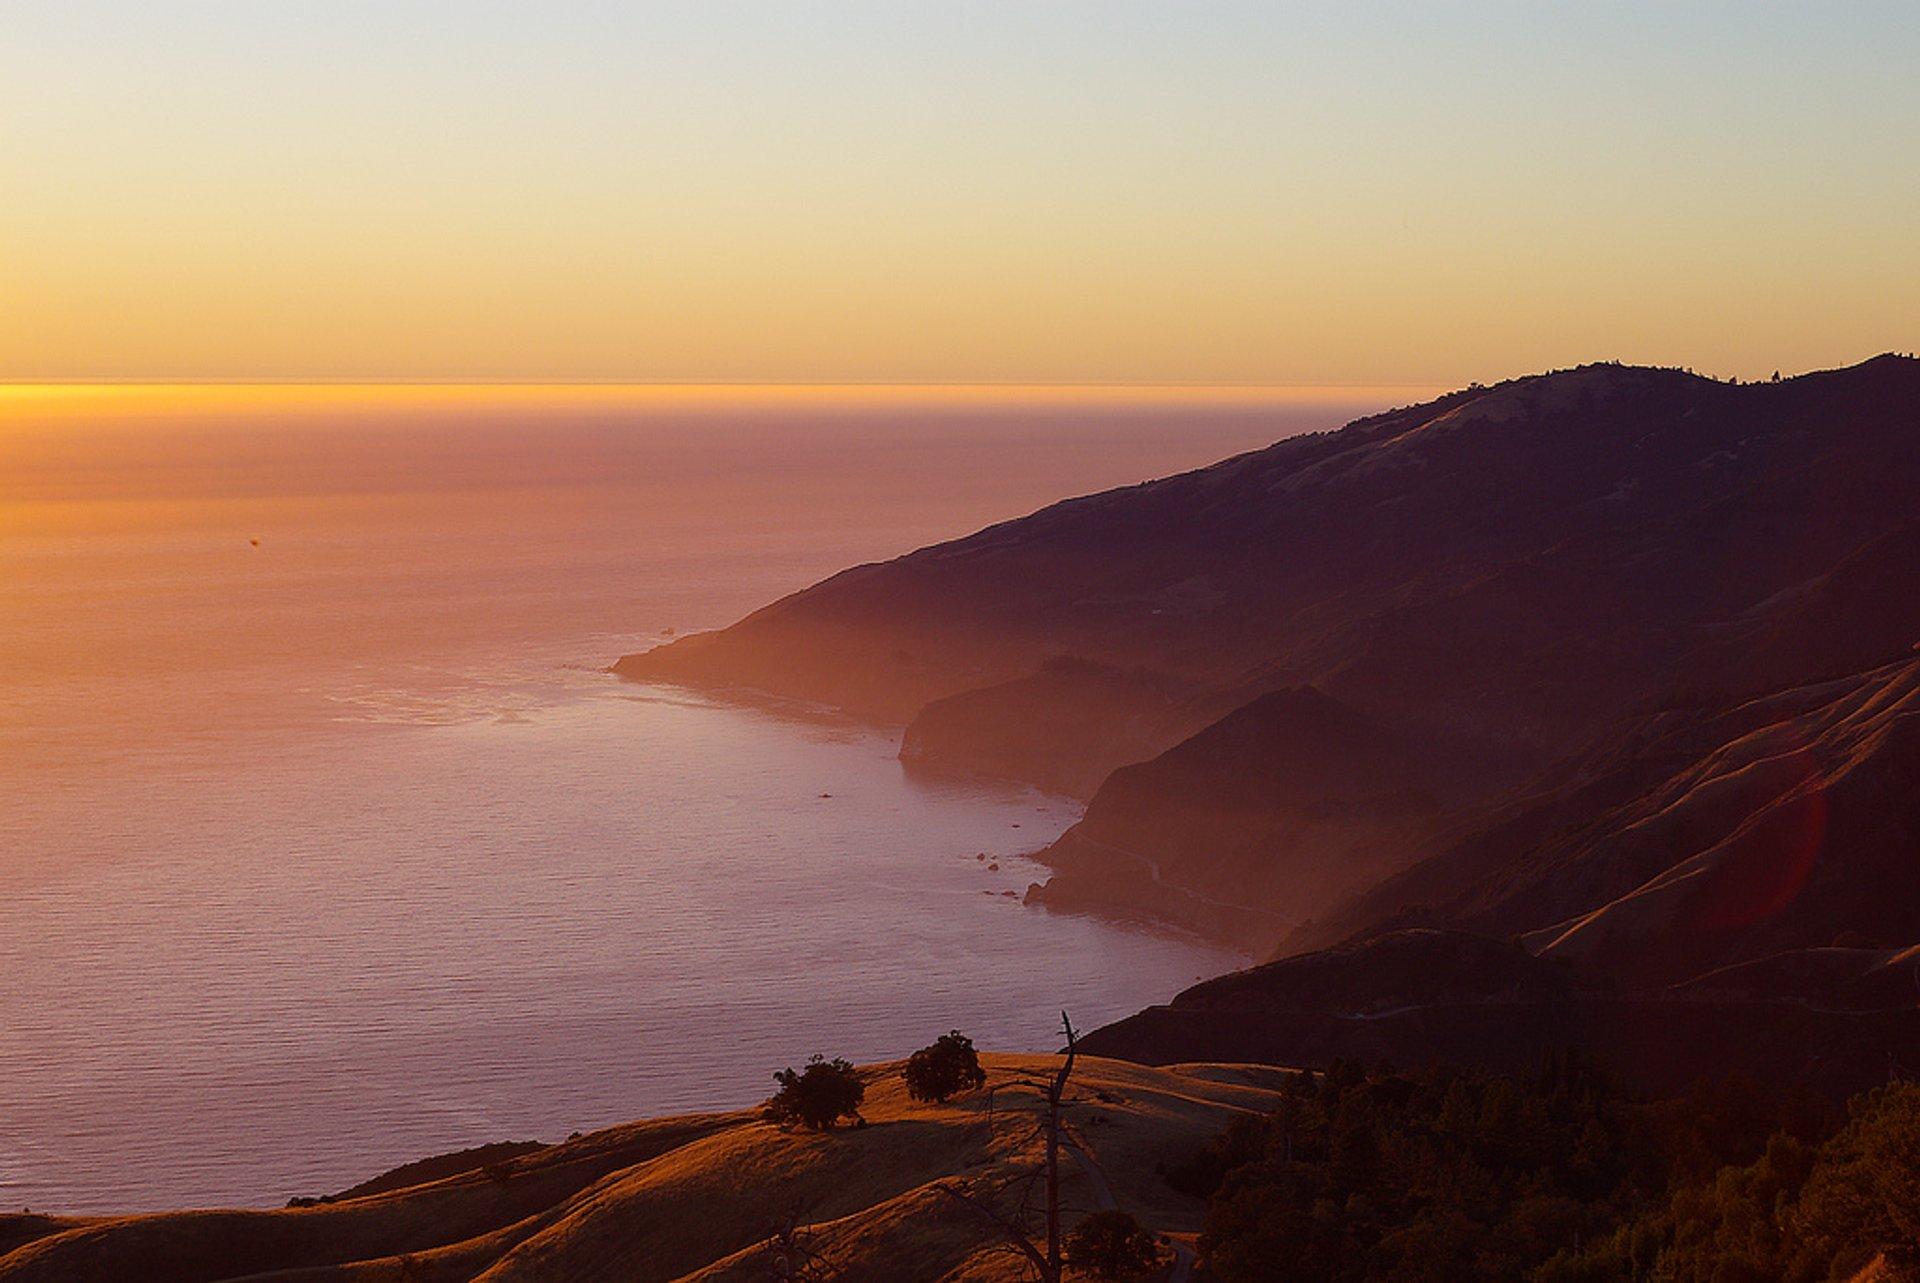 Prewitt Ridge in California 2020 - Best Time